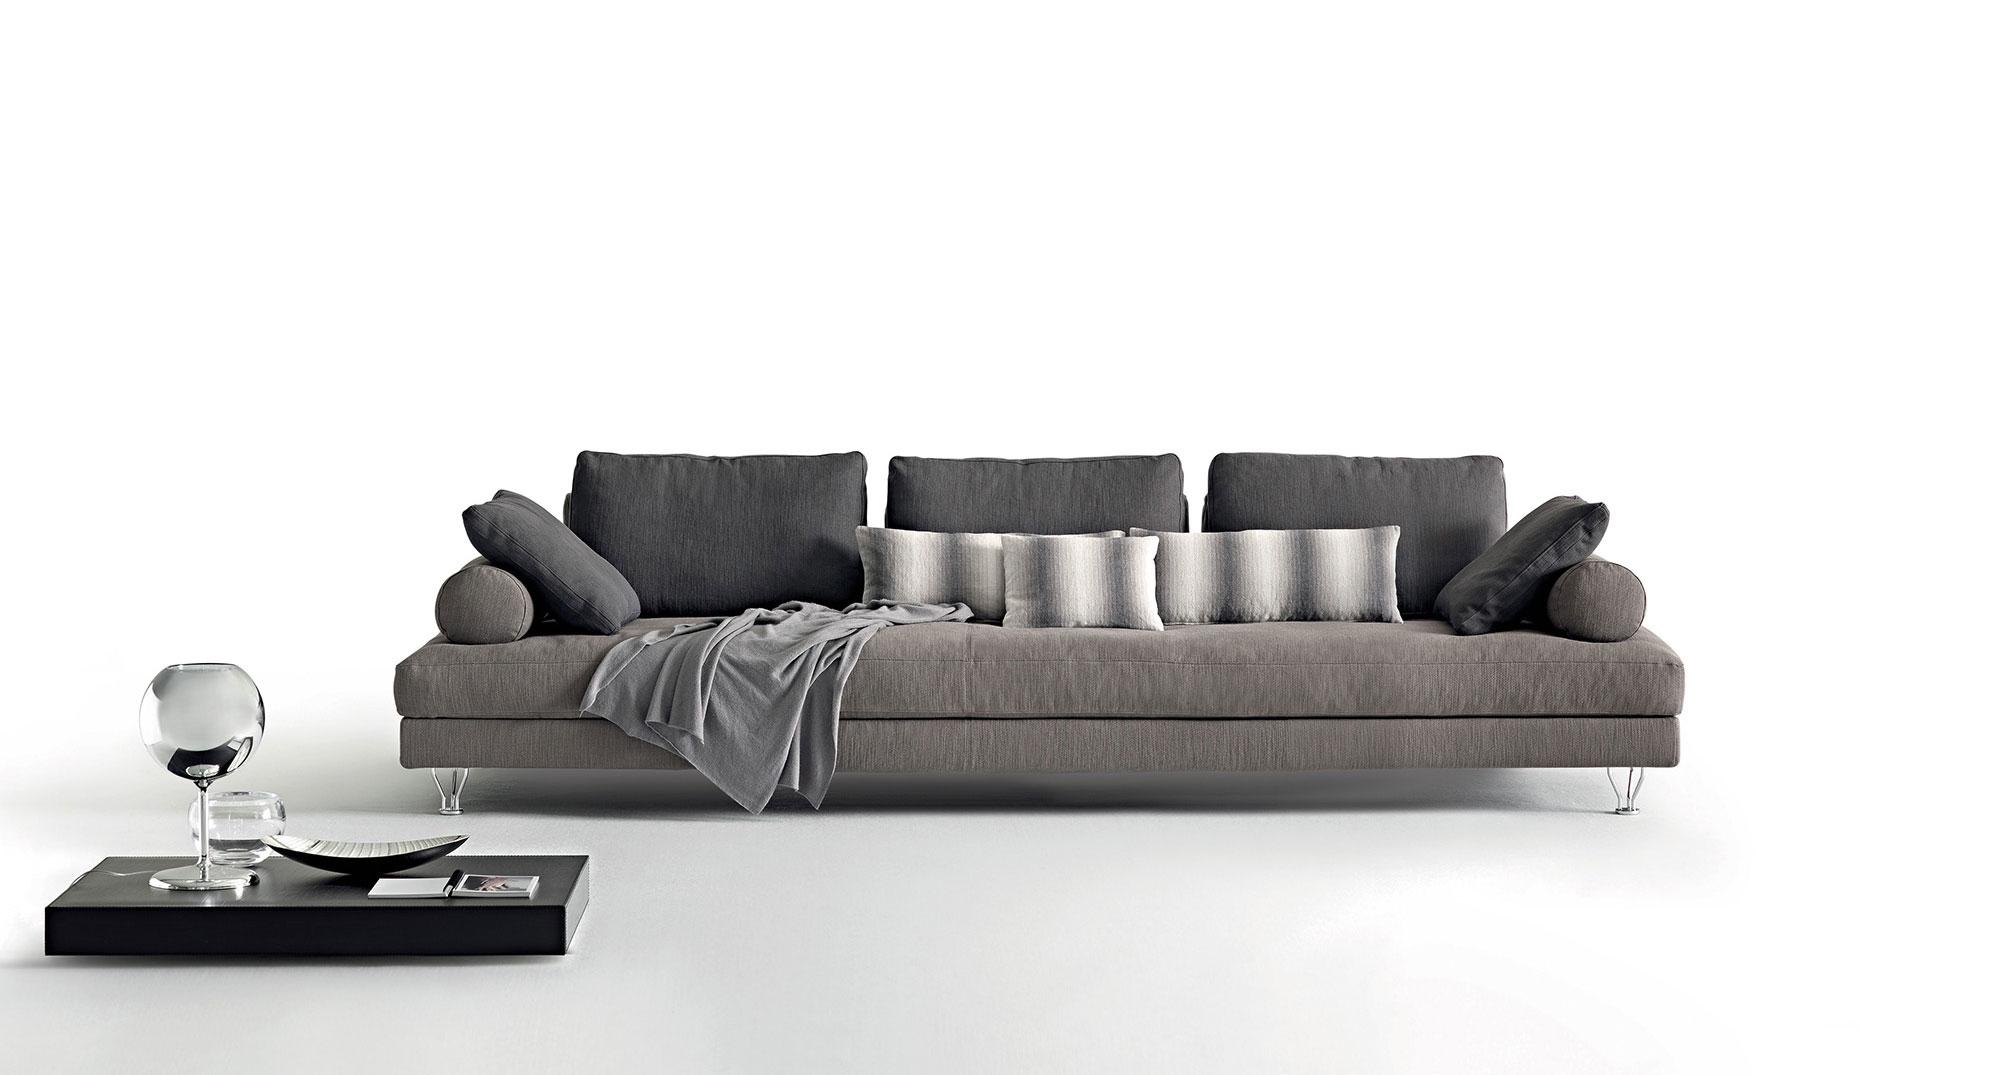 outlet del divano varedo idee per la casa